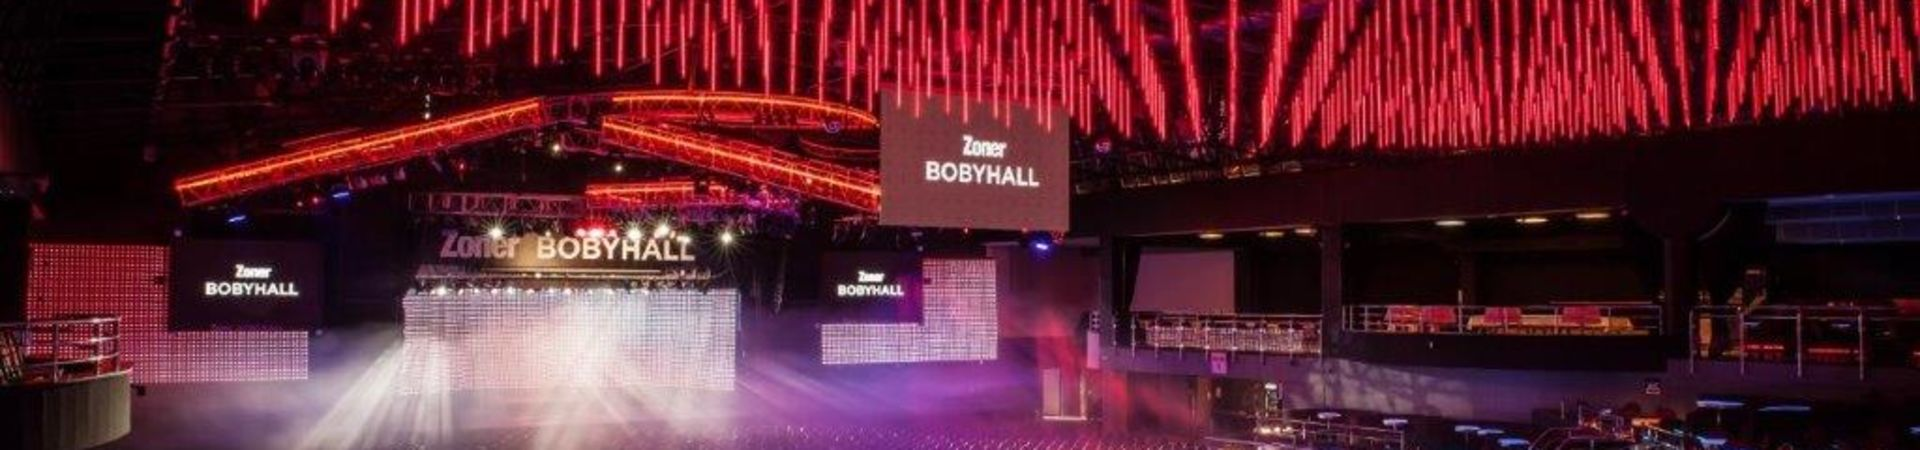 Hotel Cosmopolitan Bobycentrum - Zoner Bobyhall